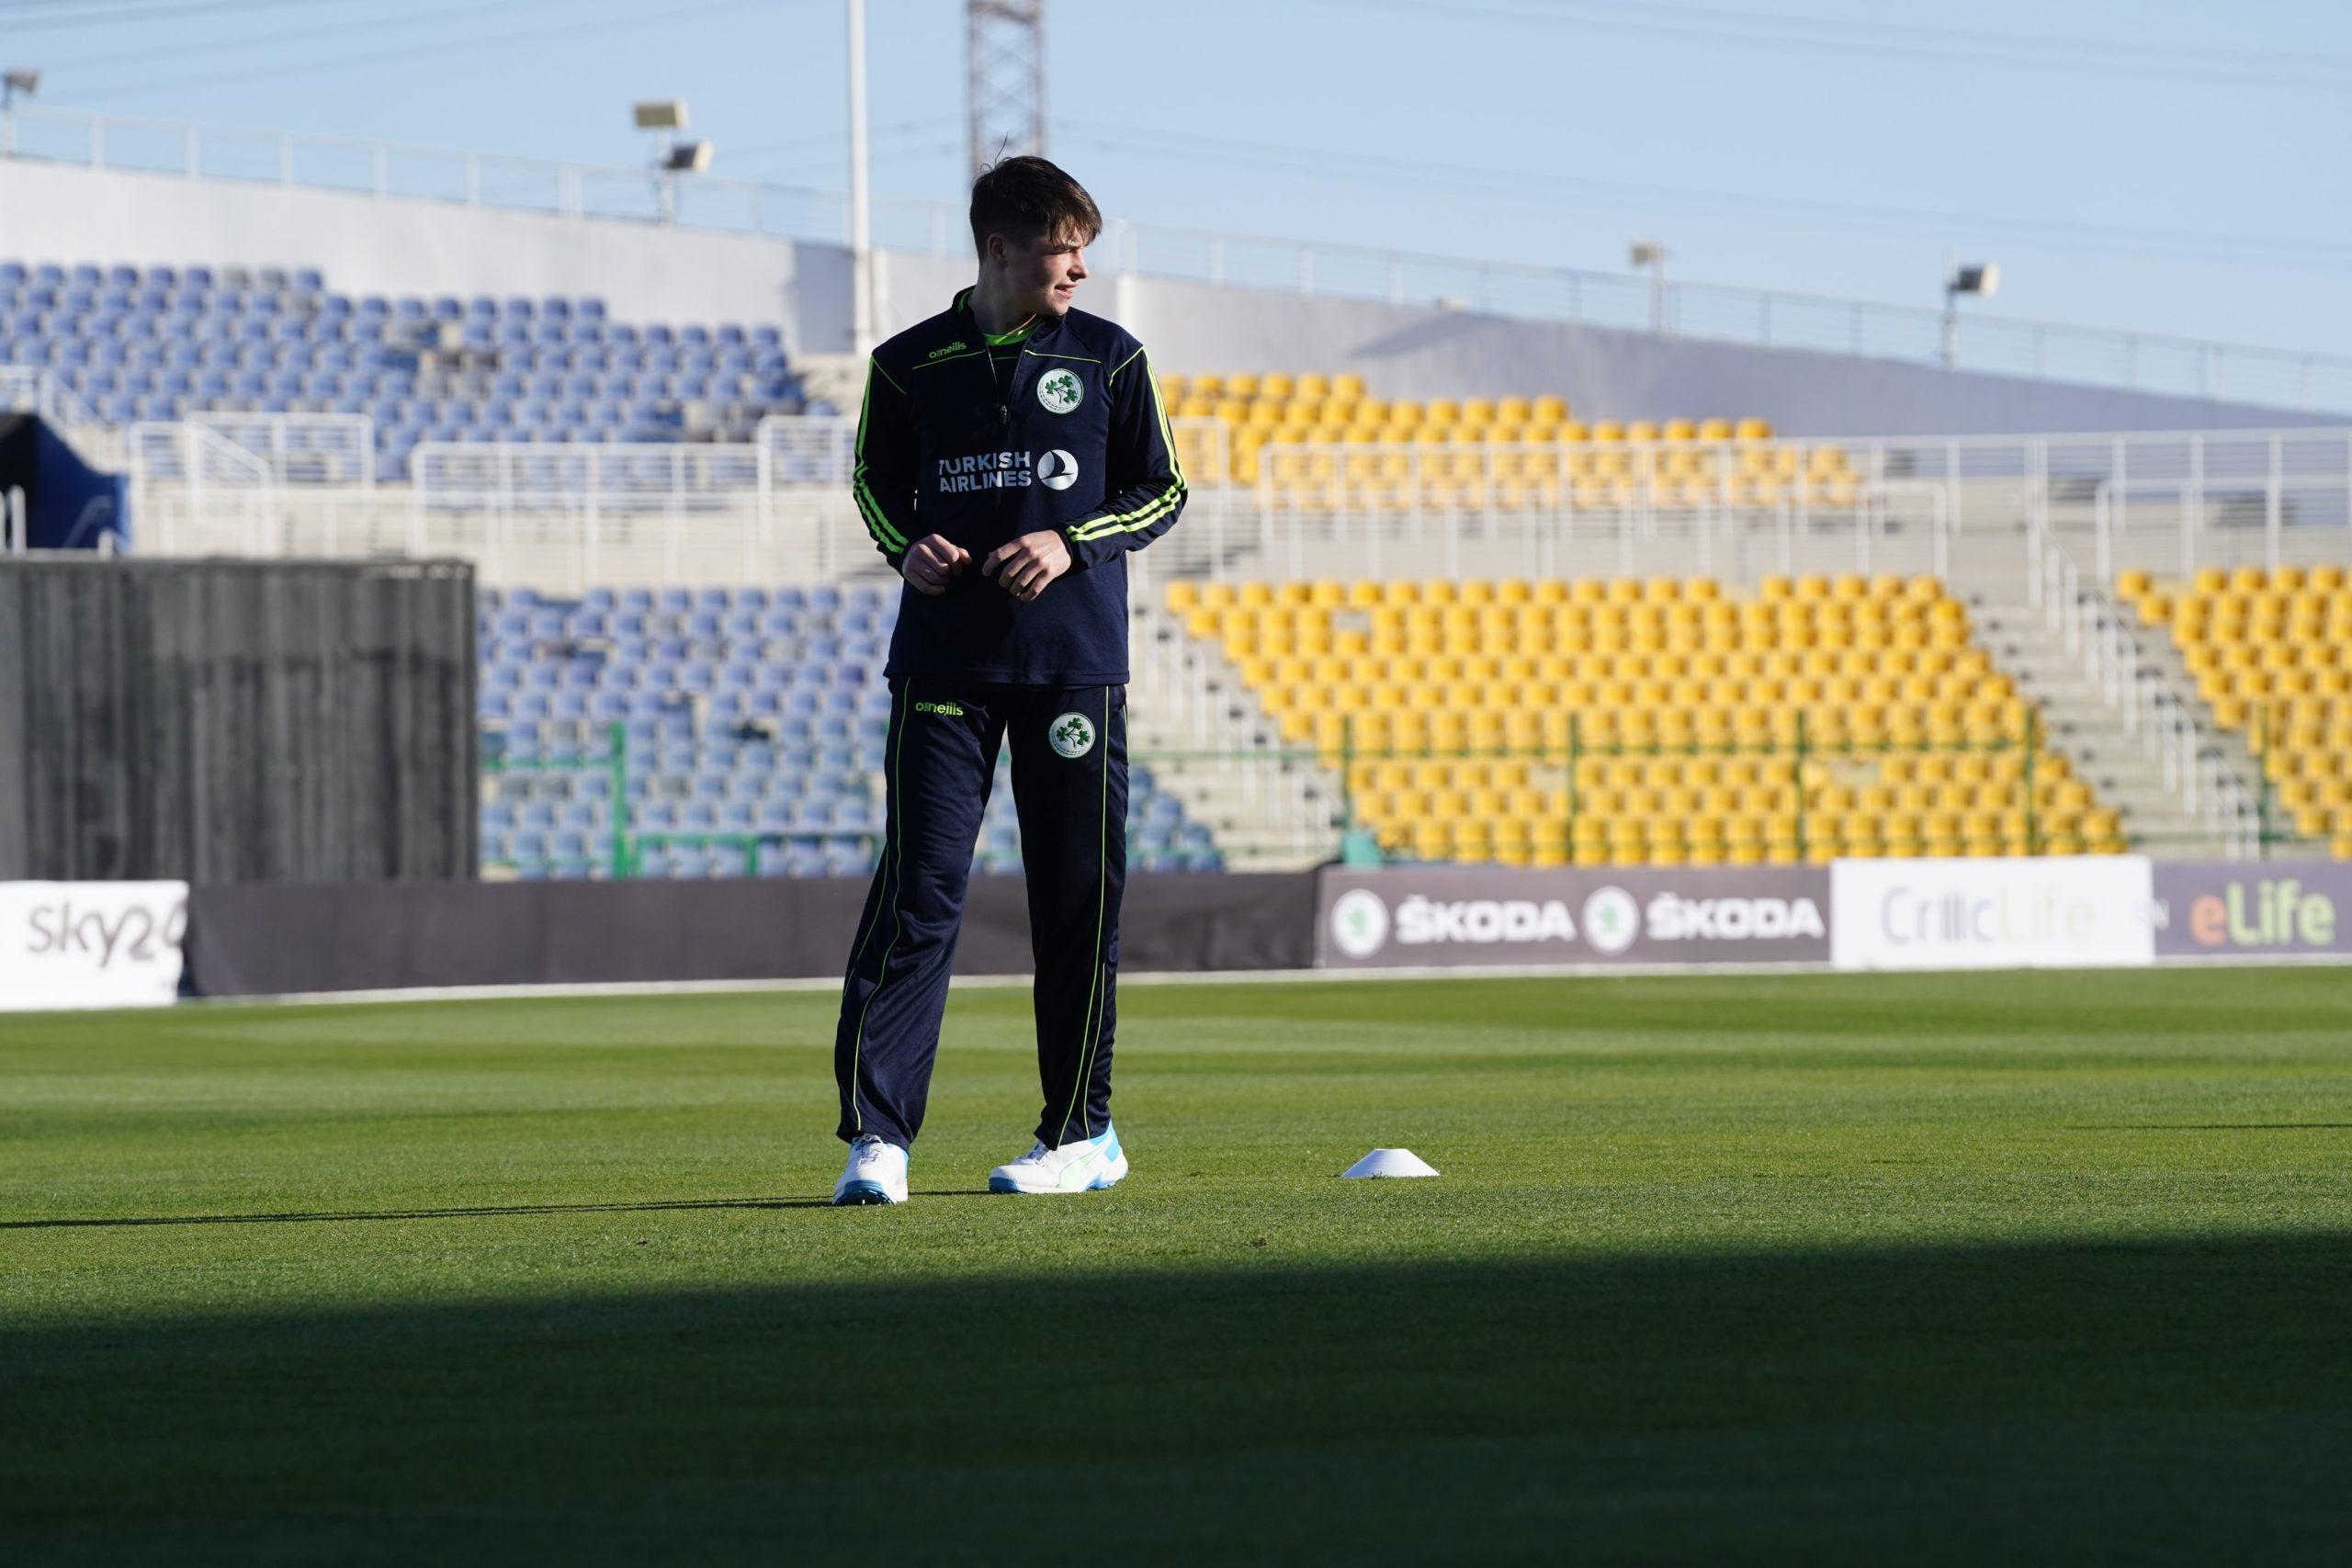 Cricket Ireland: Tomorrow's ODI suspended; no new cases